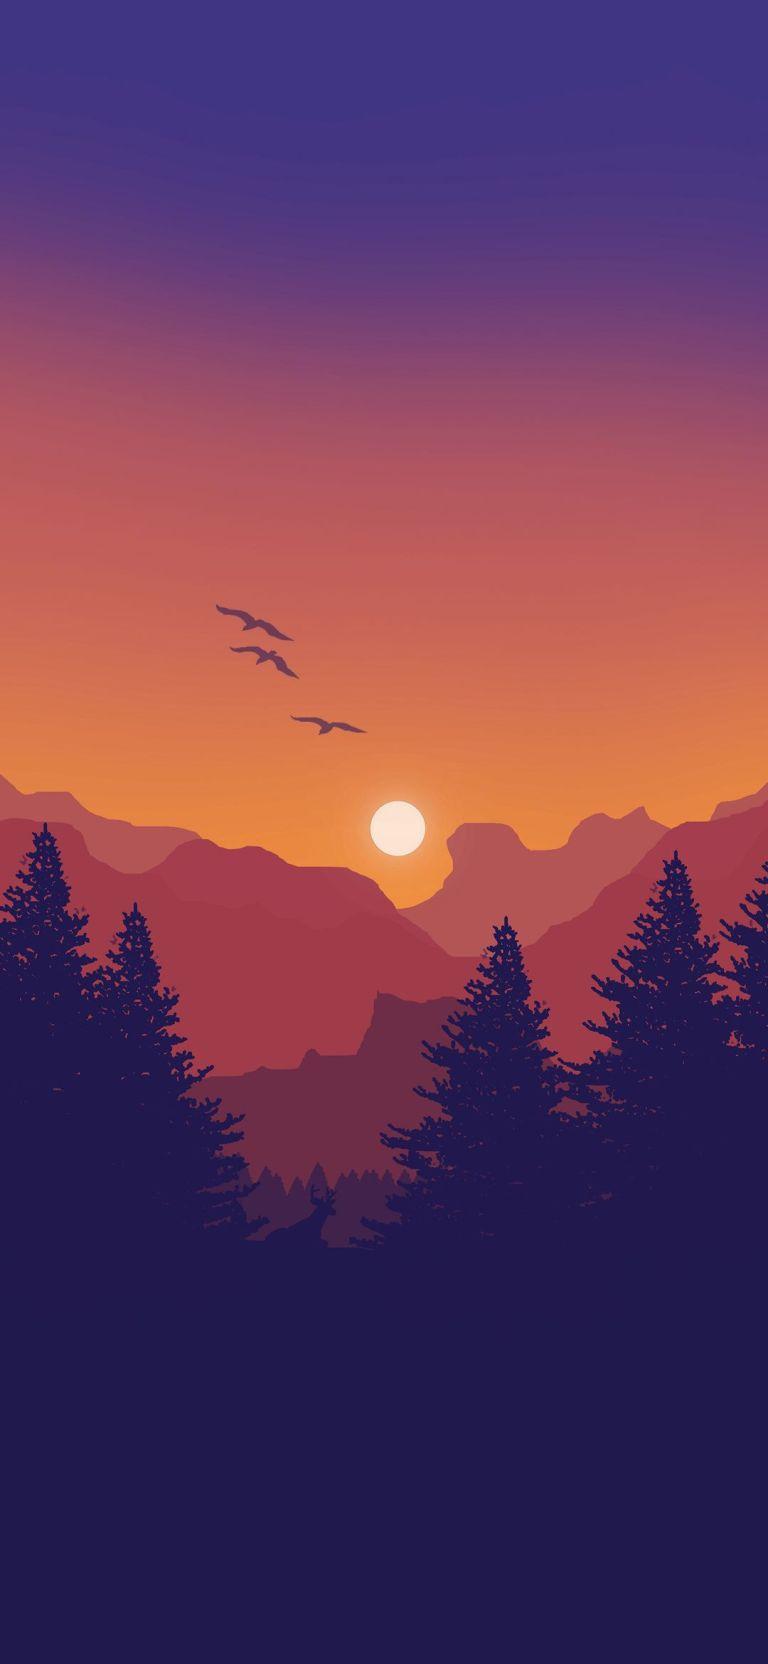 Minimal Mountain iPhone Wallpapers ...